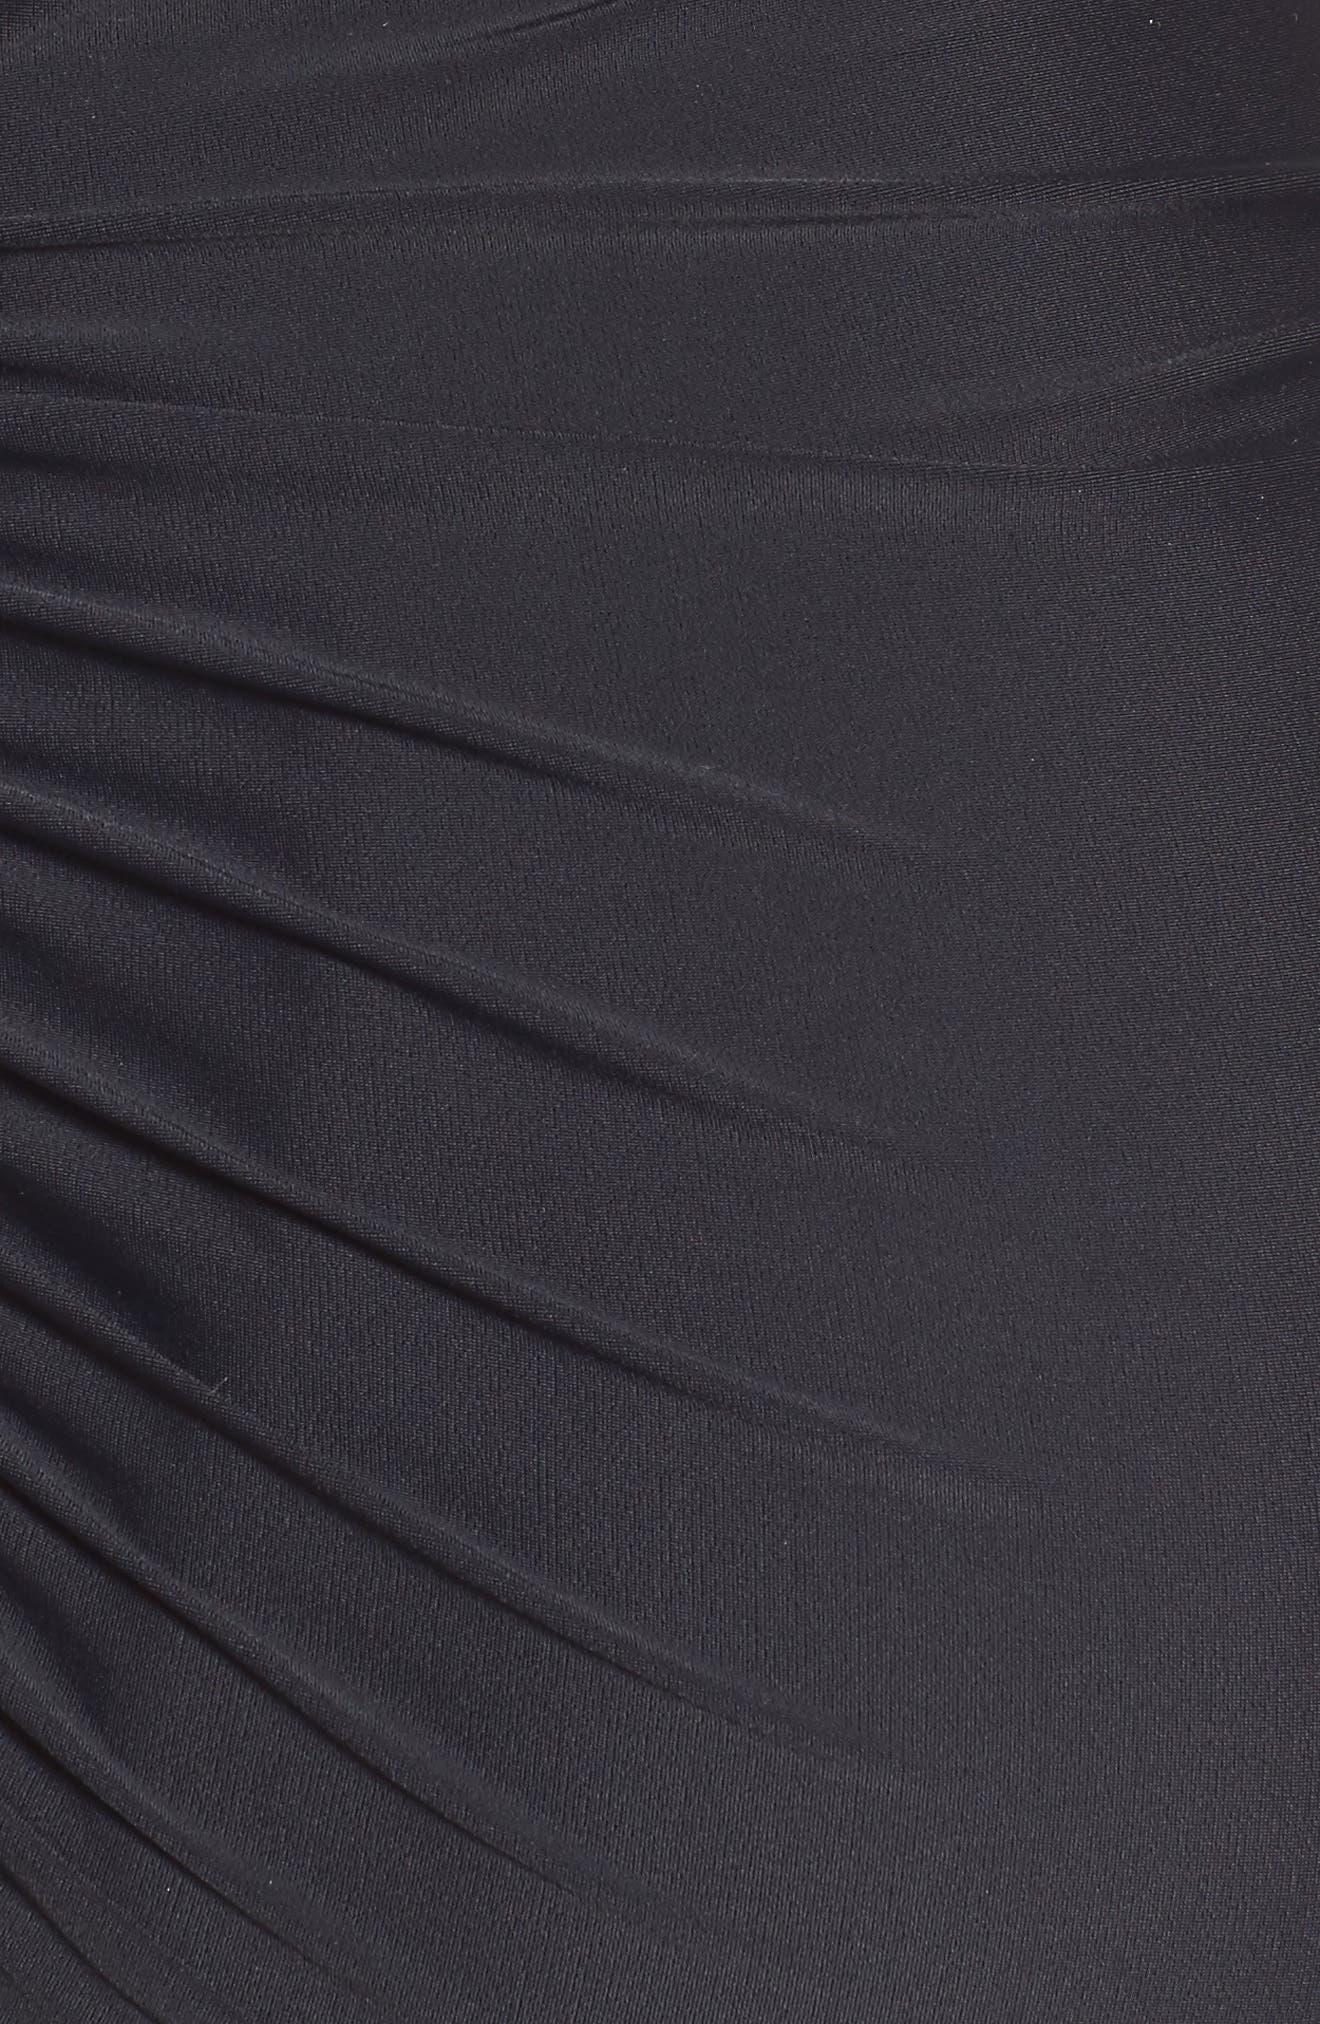 Ruched Maternity Tankini Swimsuit,                             Alternate thumbnail 6, color,                             BLACK